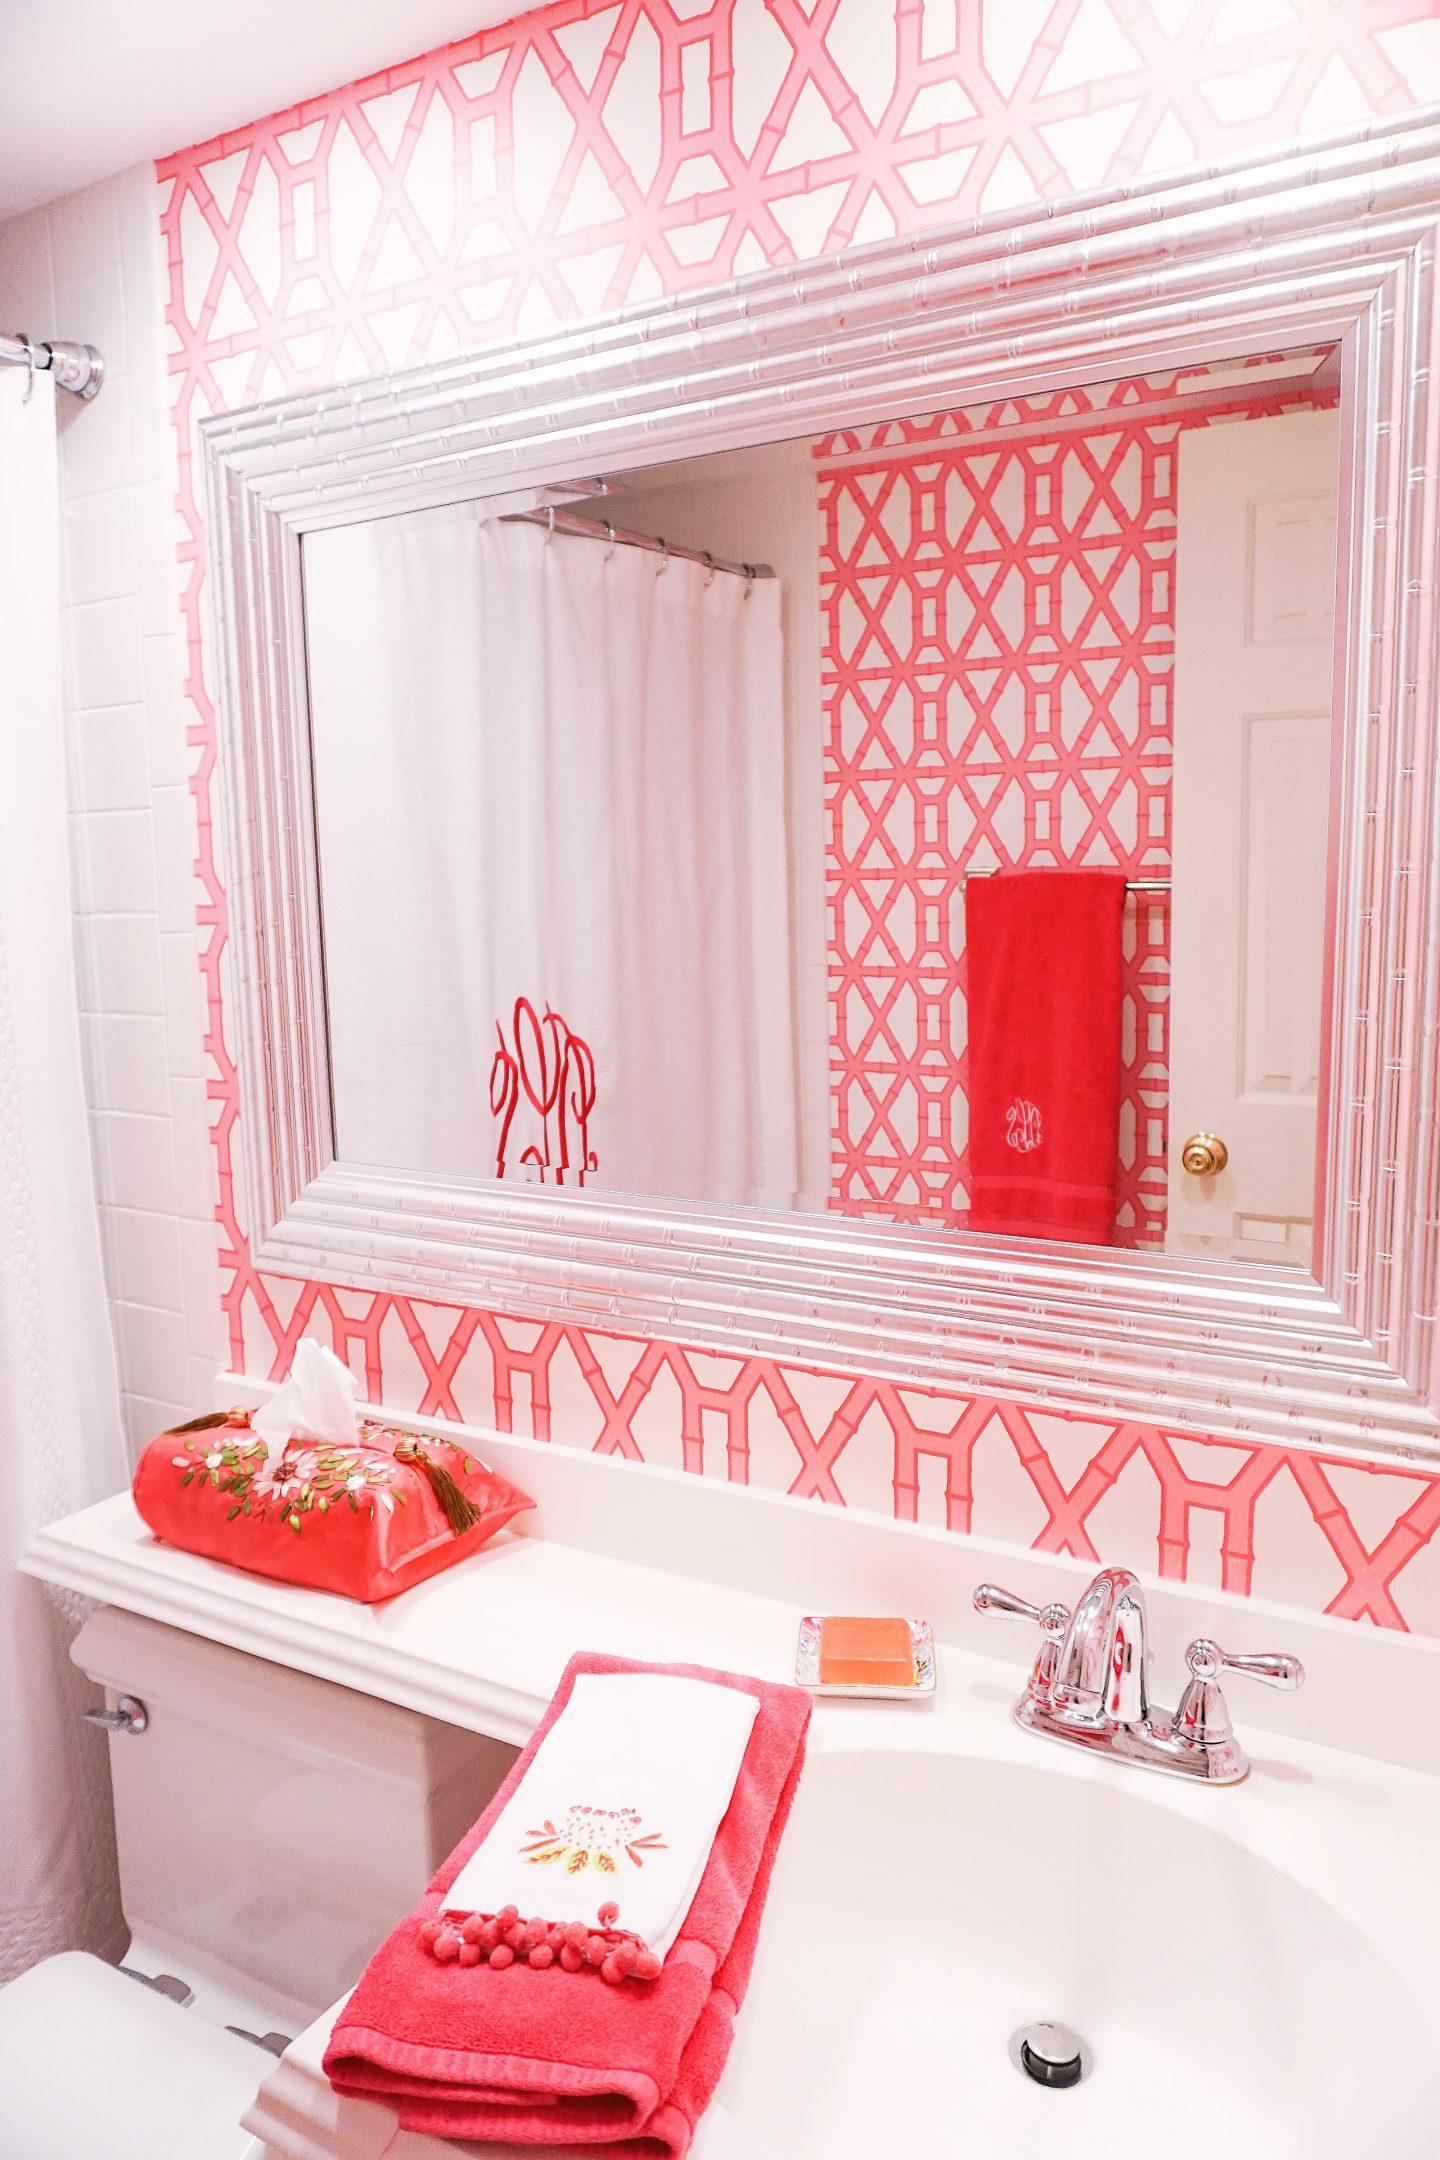 Vero Beach Townhouse pink decor